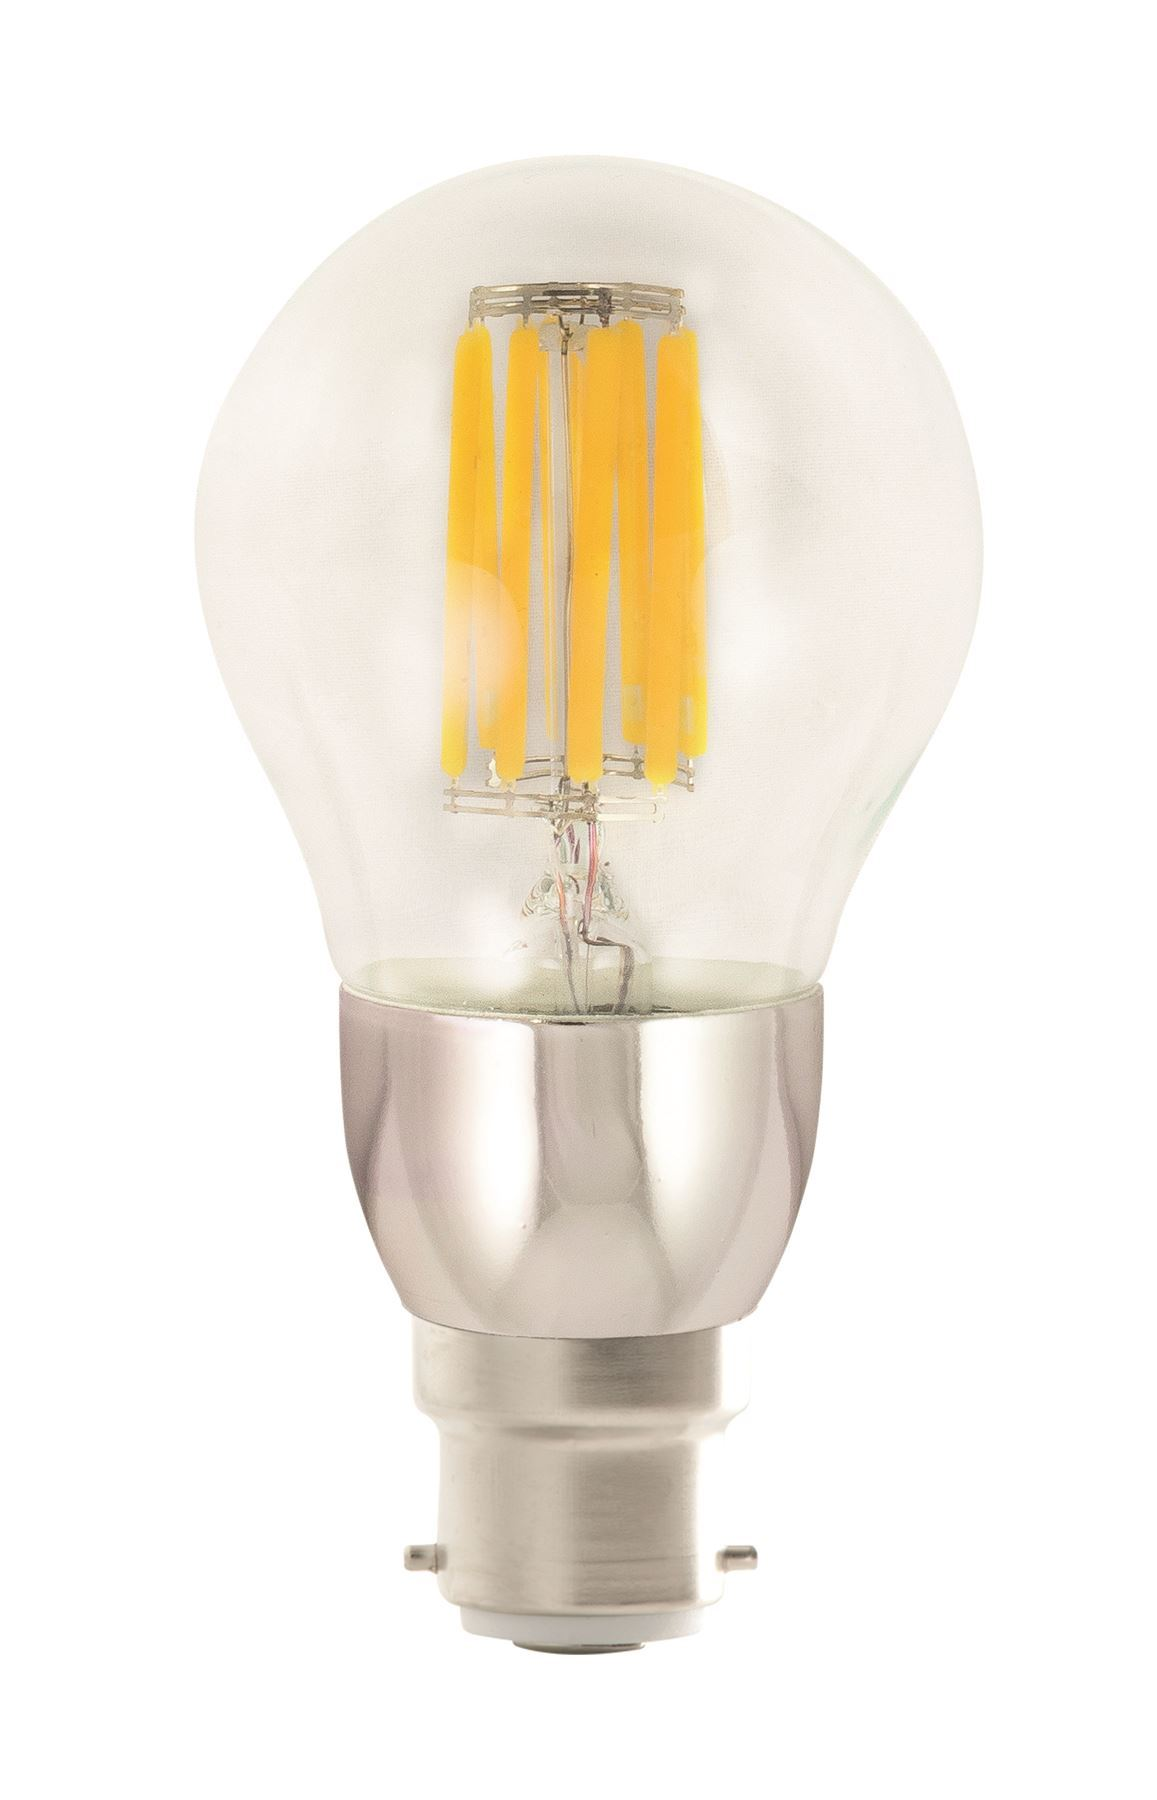 luceco led filament a60 vintage old fashioned retro light bulb dimmable e27 b22 ebay. Black Bedroom Furniture Sets. Home Design Ideas